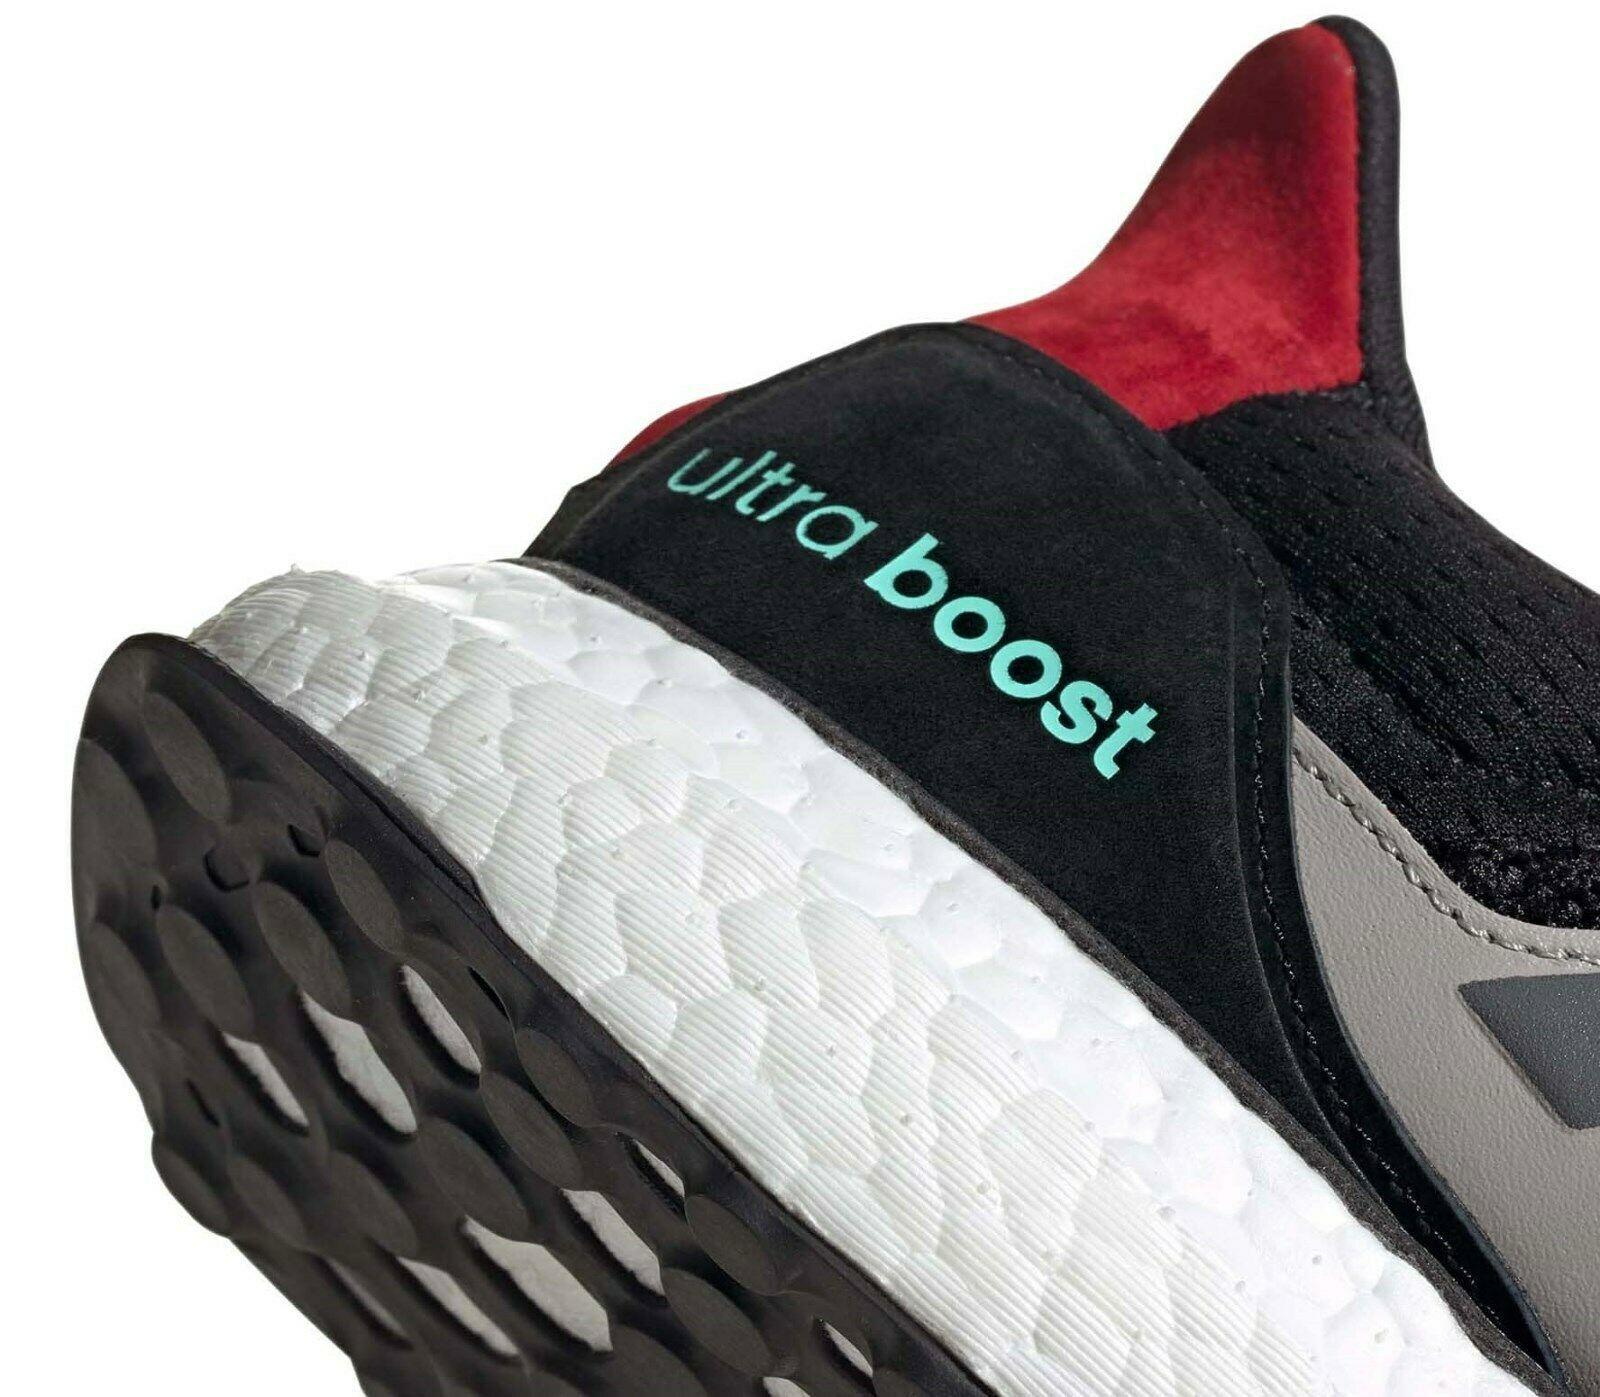 ADIDAS ULTRABOOST 1.0 S&L BLACK/GREY/RED SIZE 8 NEW W/BOX FAST SHIPPING (EF0724)